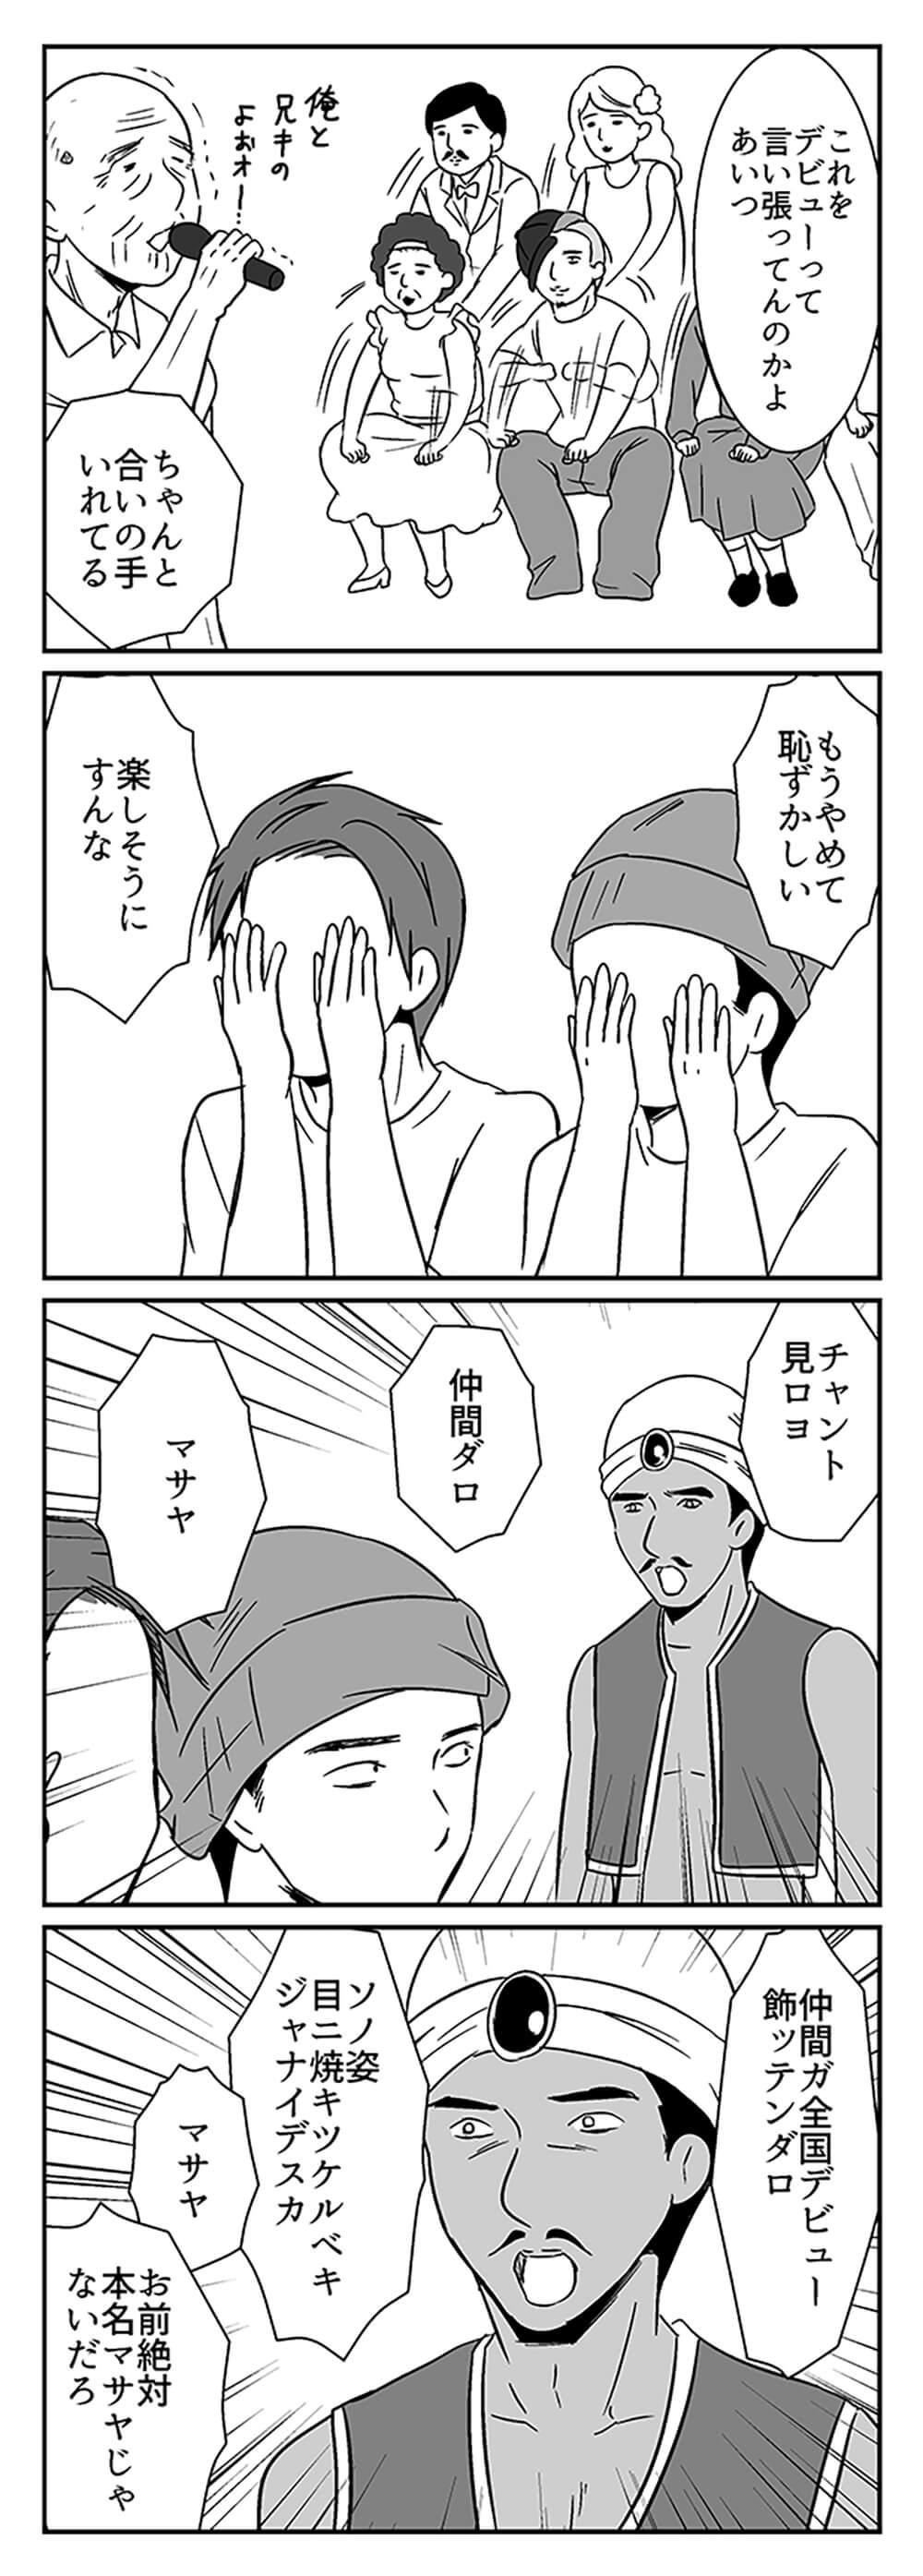 hisashi2_width1000